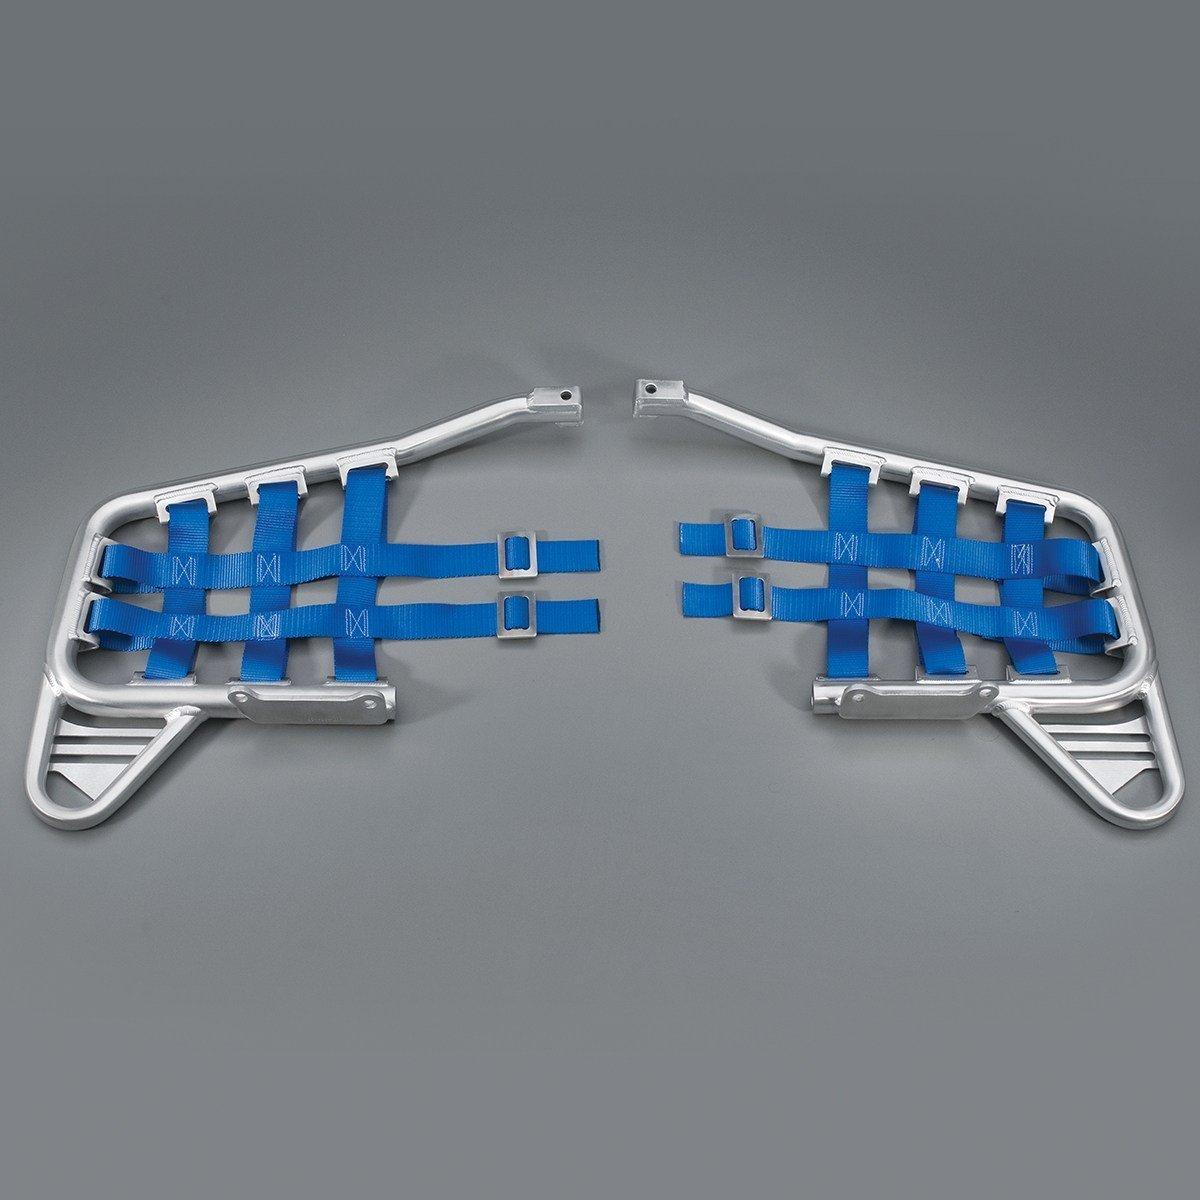 Yamaha YFZ450 GYTR Aluminum Nerf Bars (Blue Webbing) by Yamaha OEM. GYT-46D31-KT-02